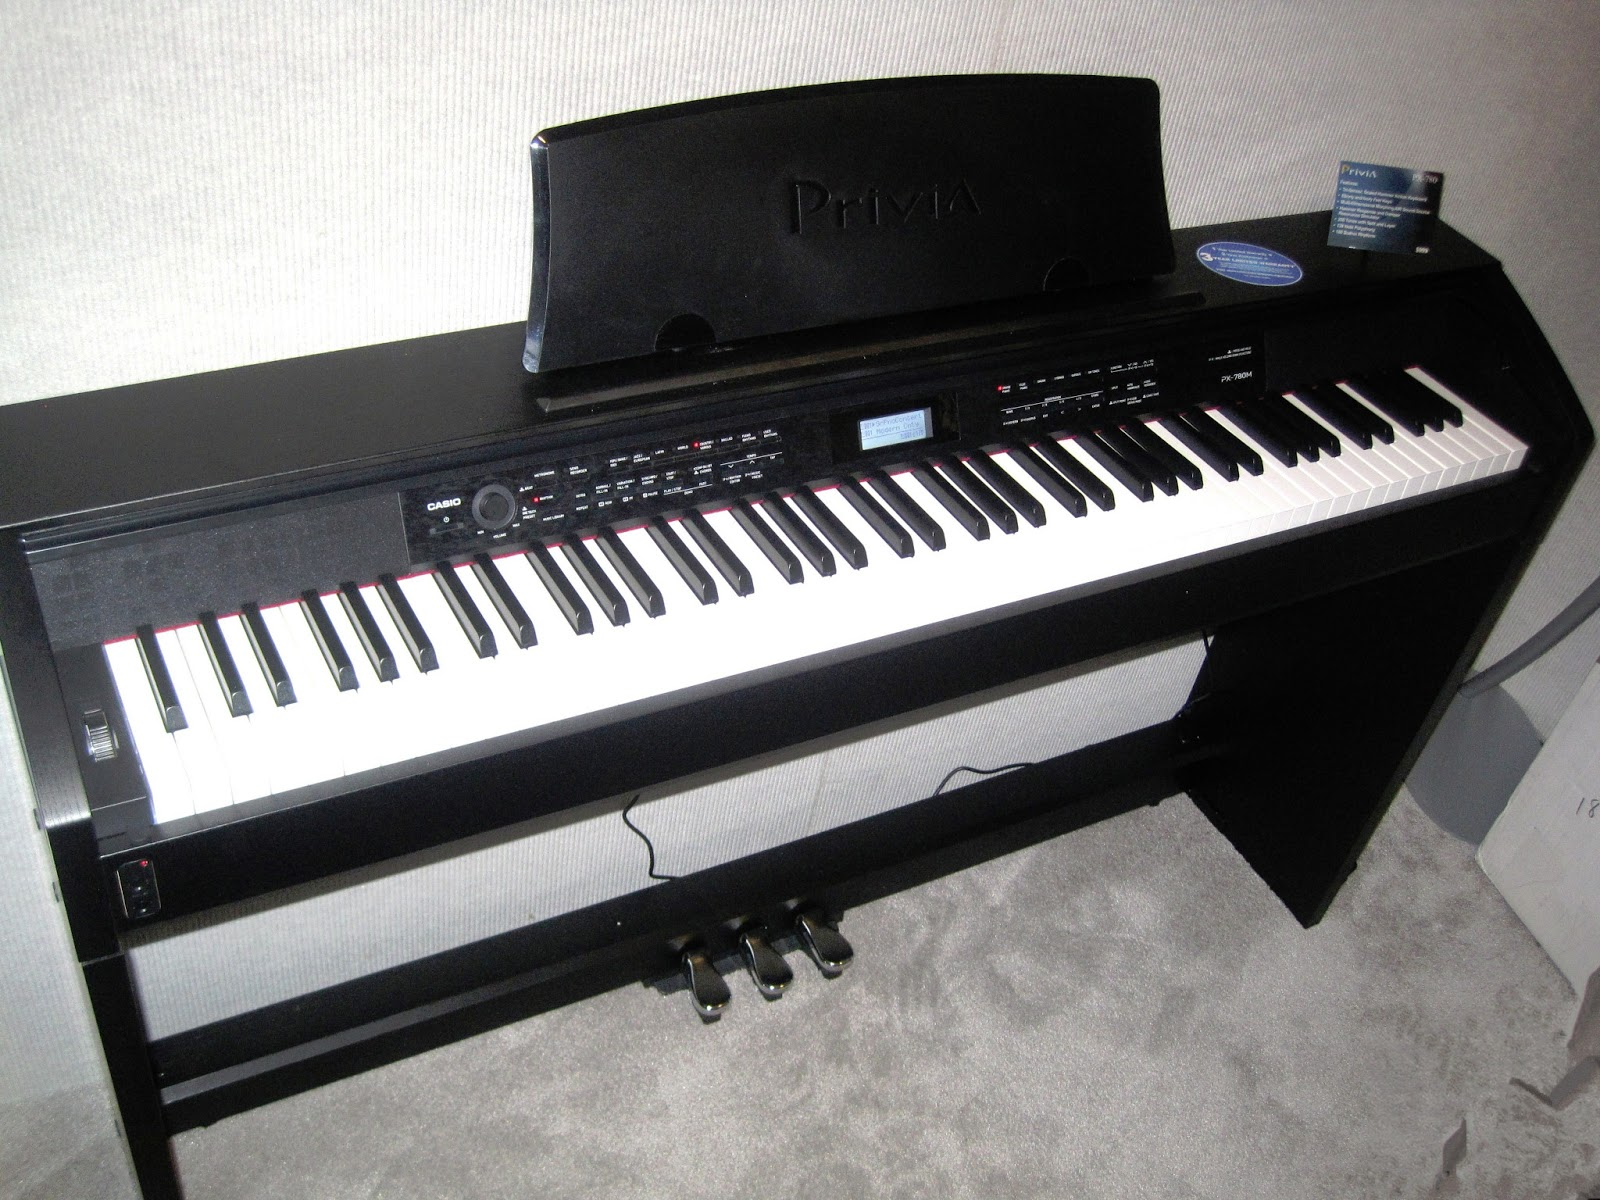 Az piano reviews review casio px780 digital piano a for Cheap yamaha keyboards